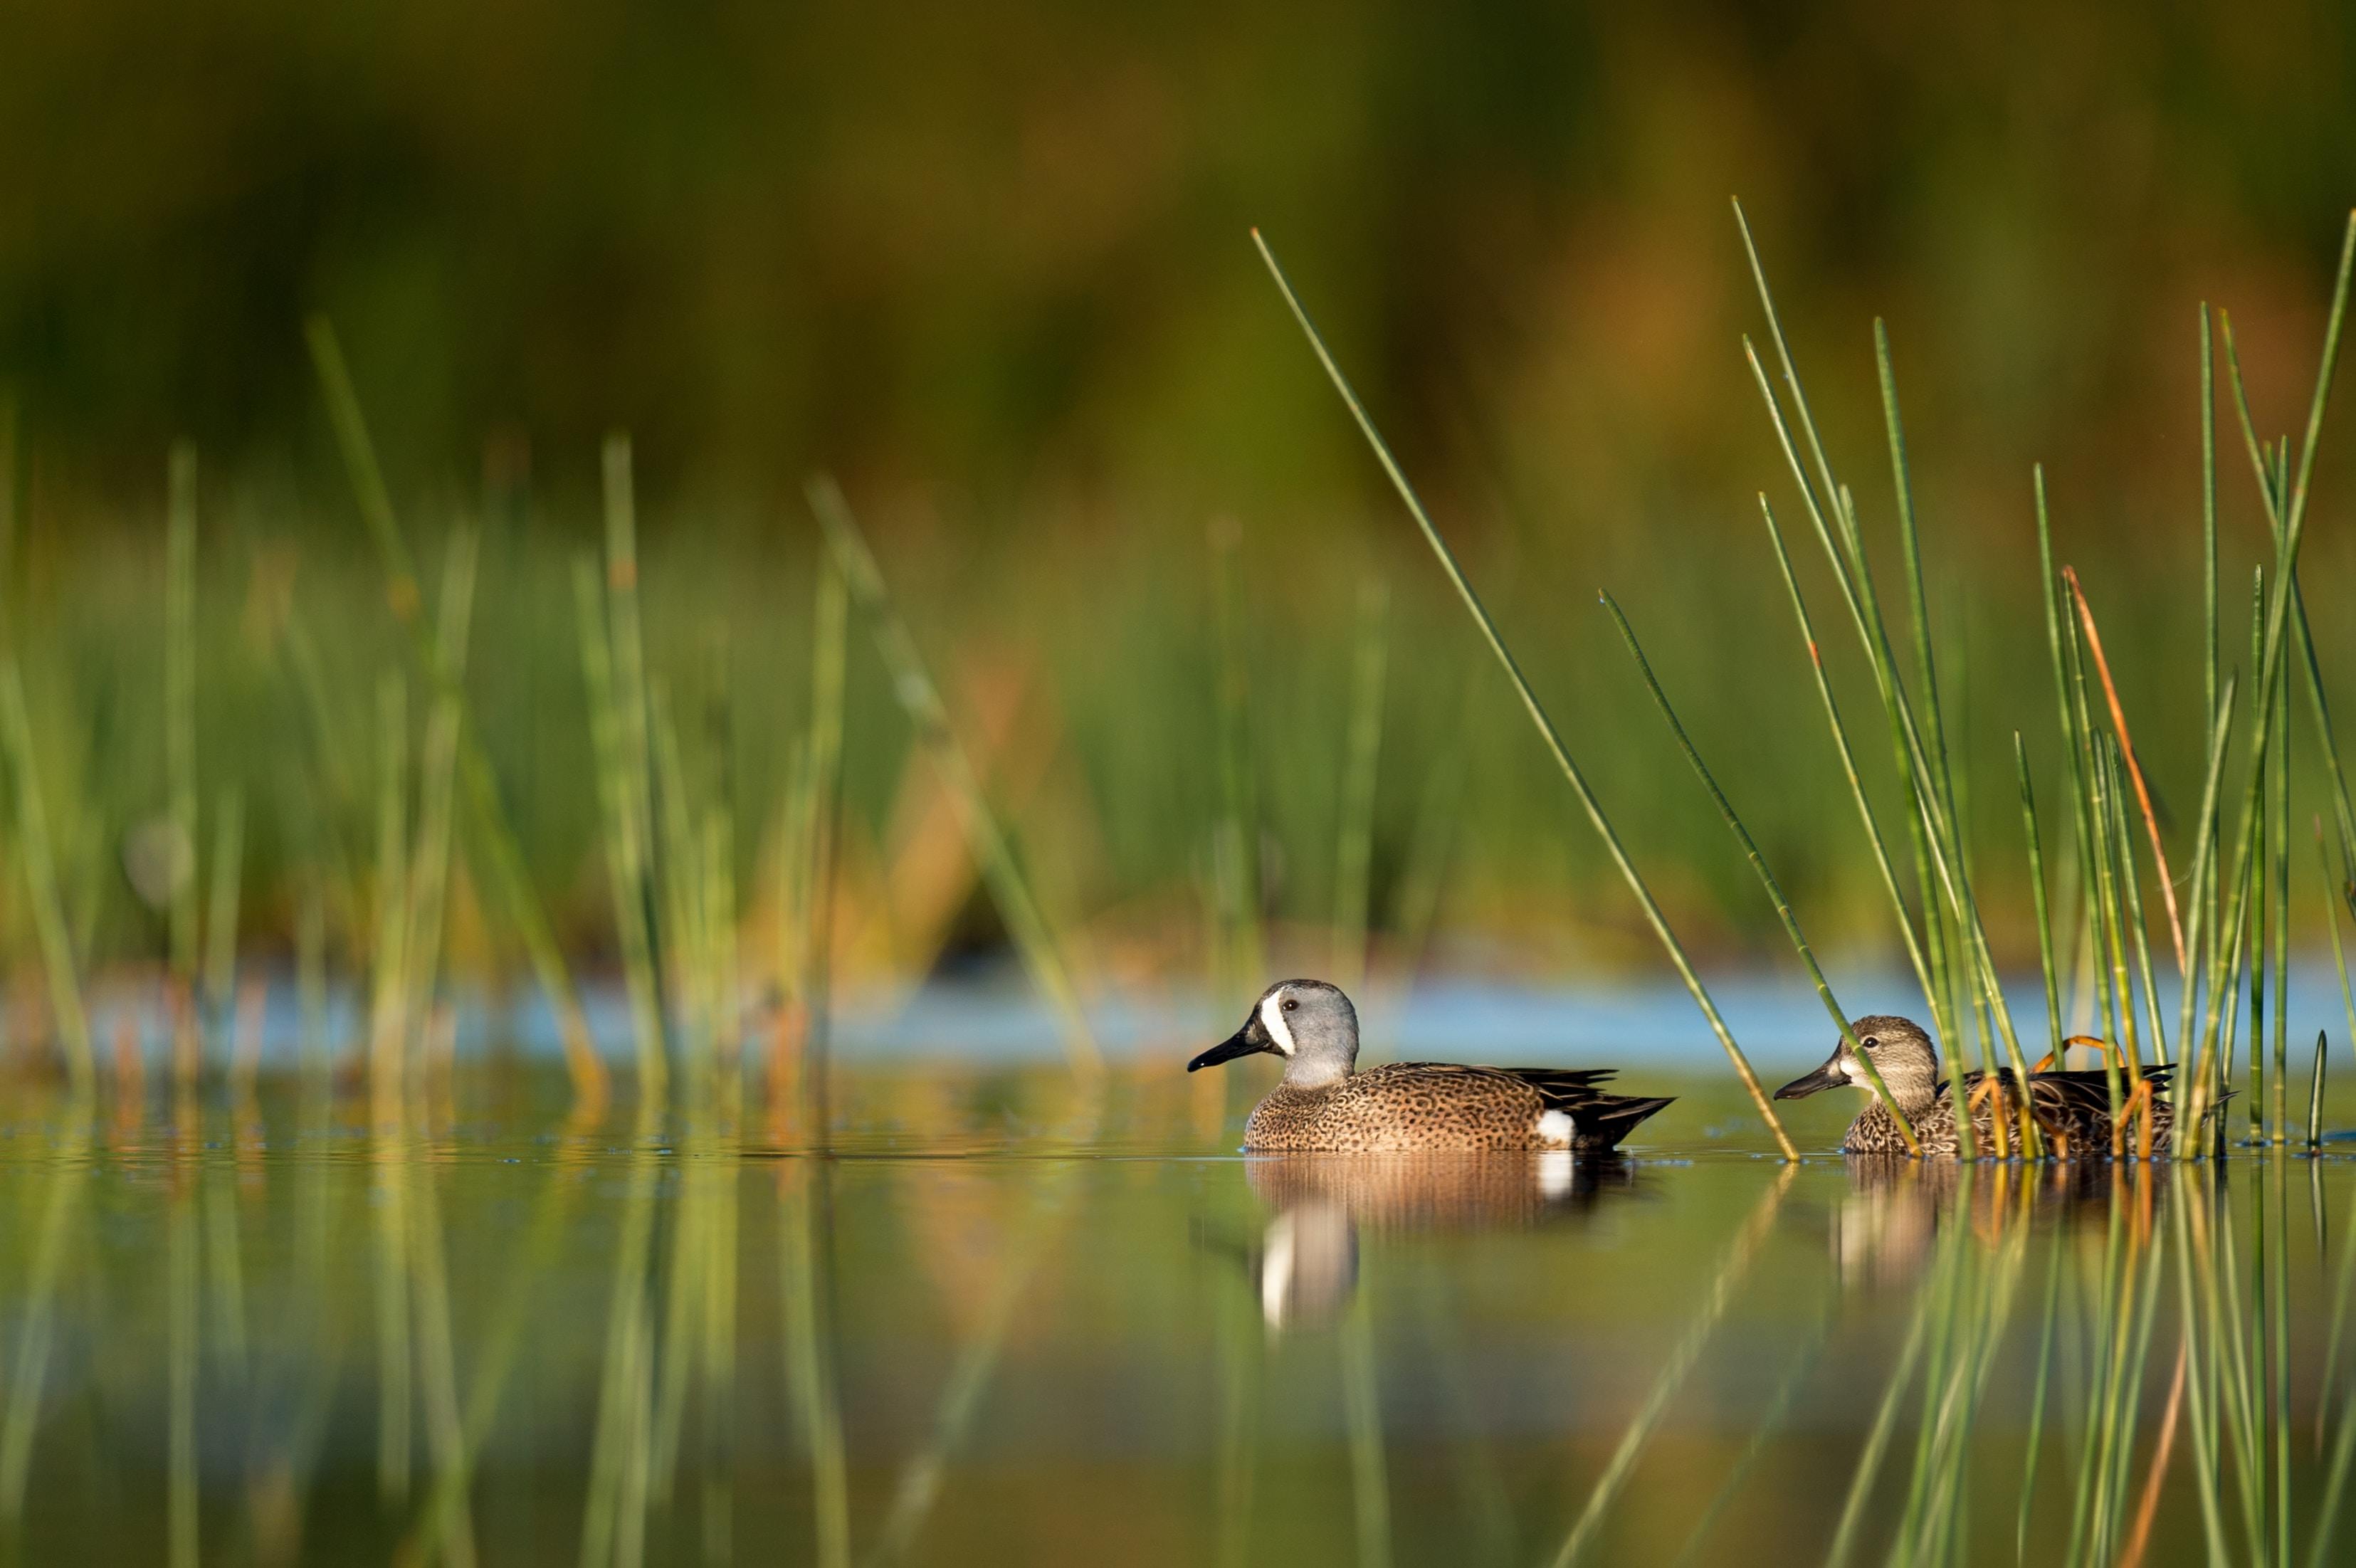 Two ducks swimming through the pond at Vero Beach